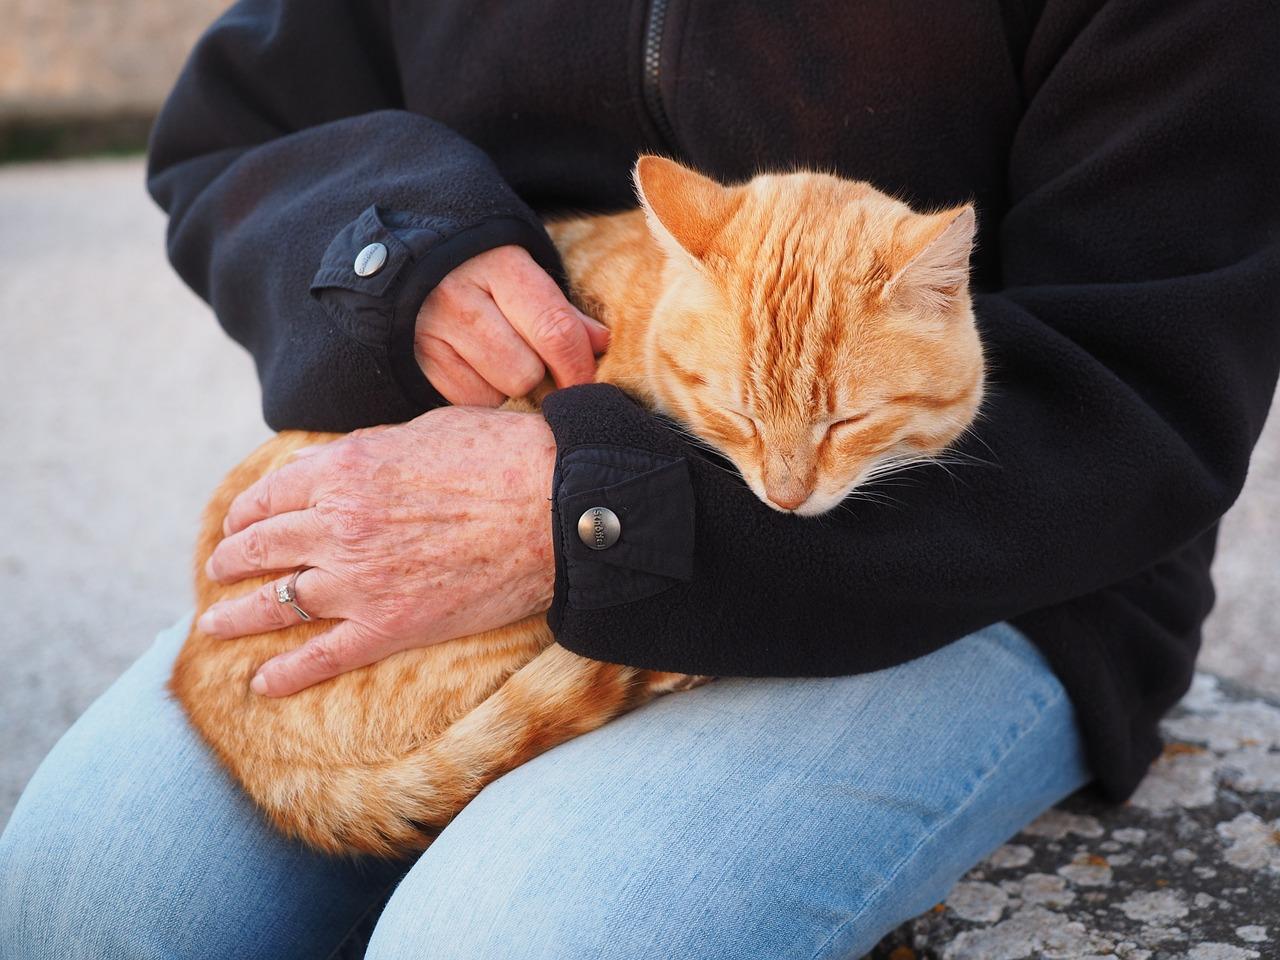 person brushing cat's fur